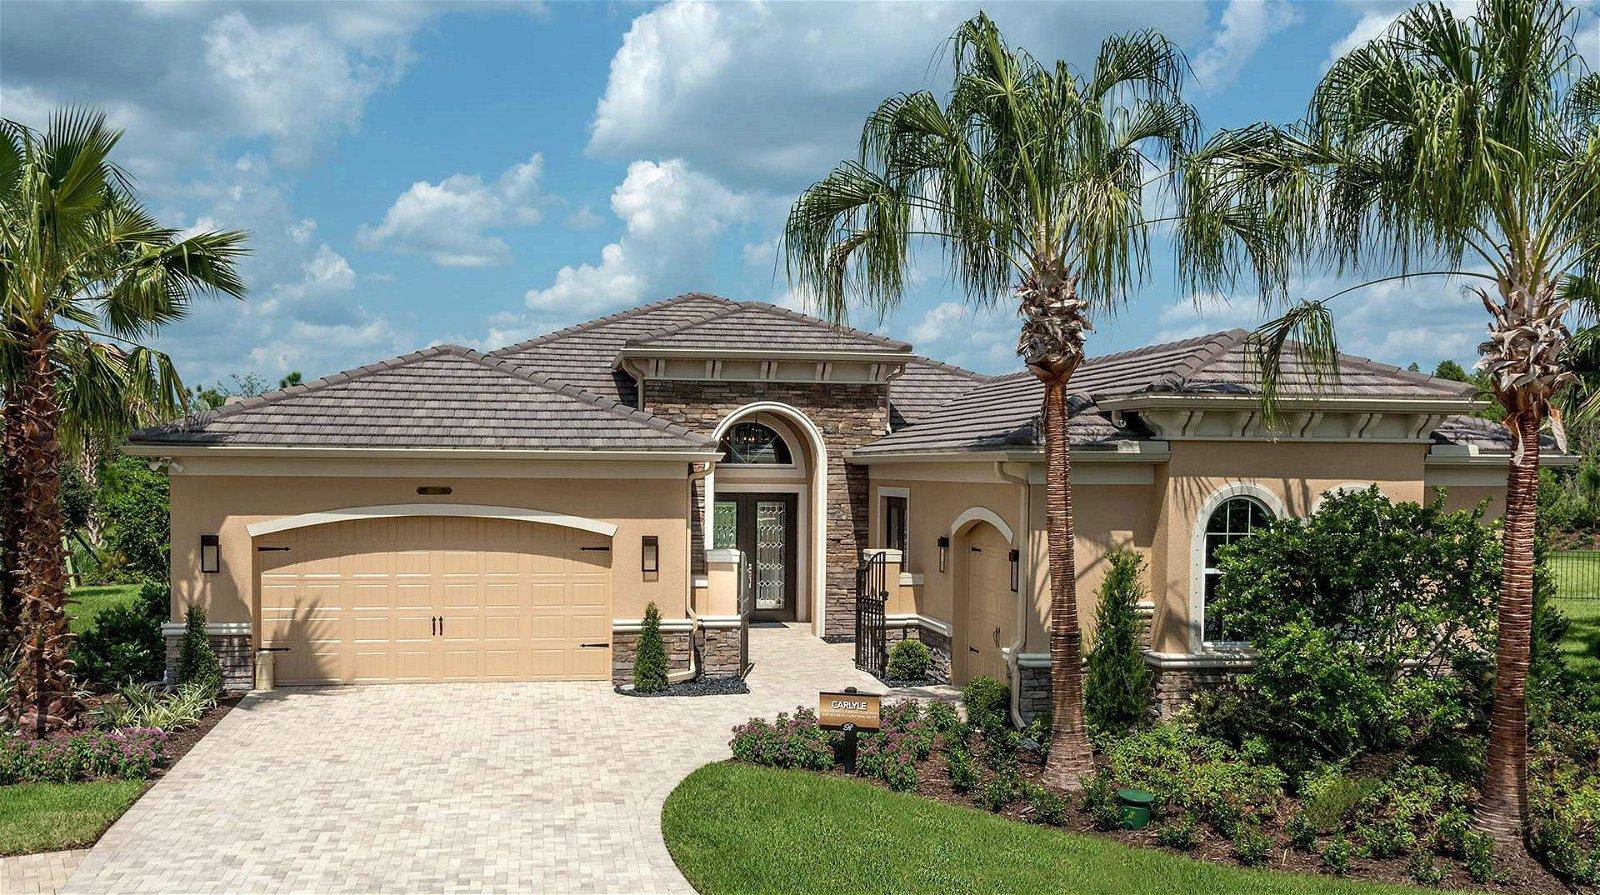 st. augustine fha mortgage, fha mortgage, st. augustine florida mortgage, st. augustine first-time home buyer fha mortgage,